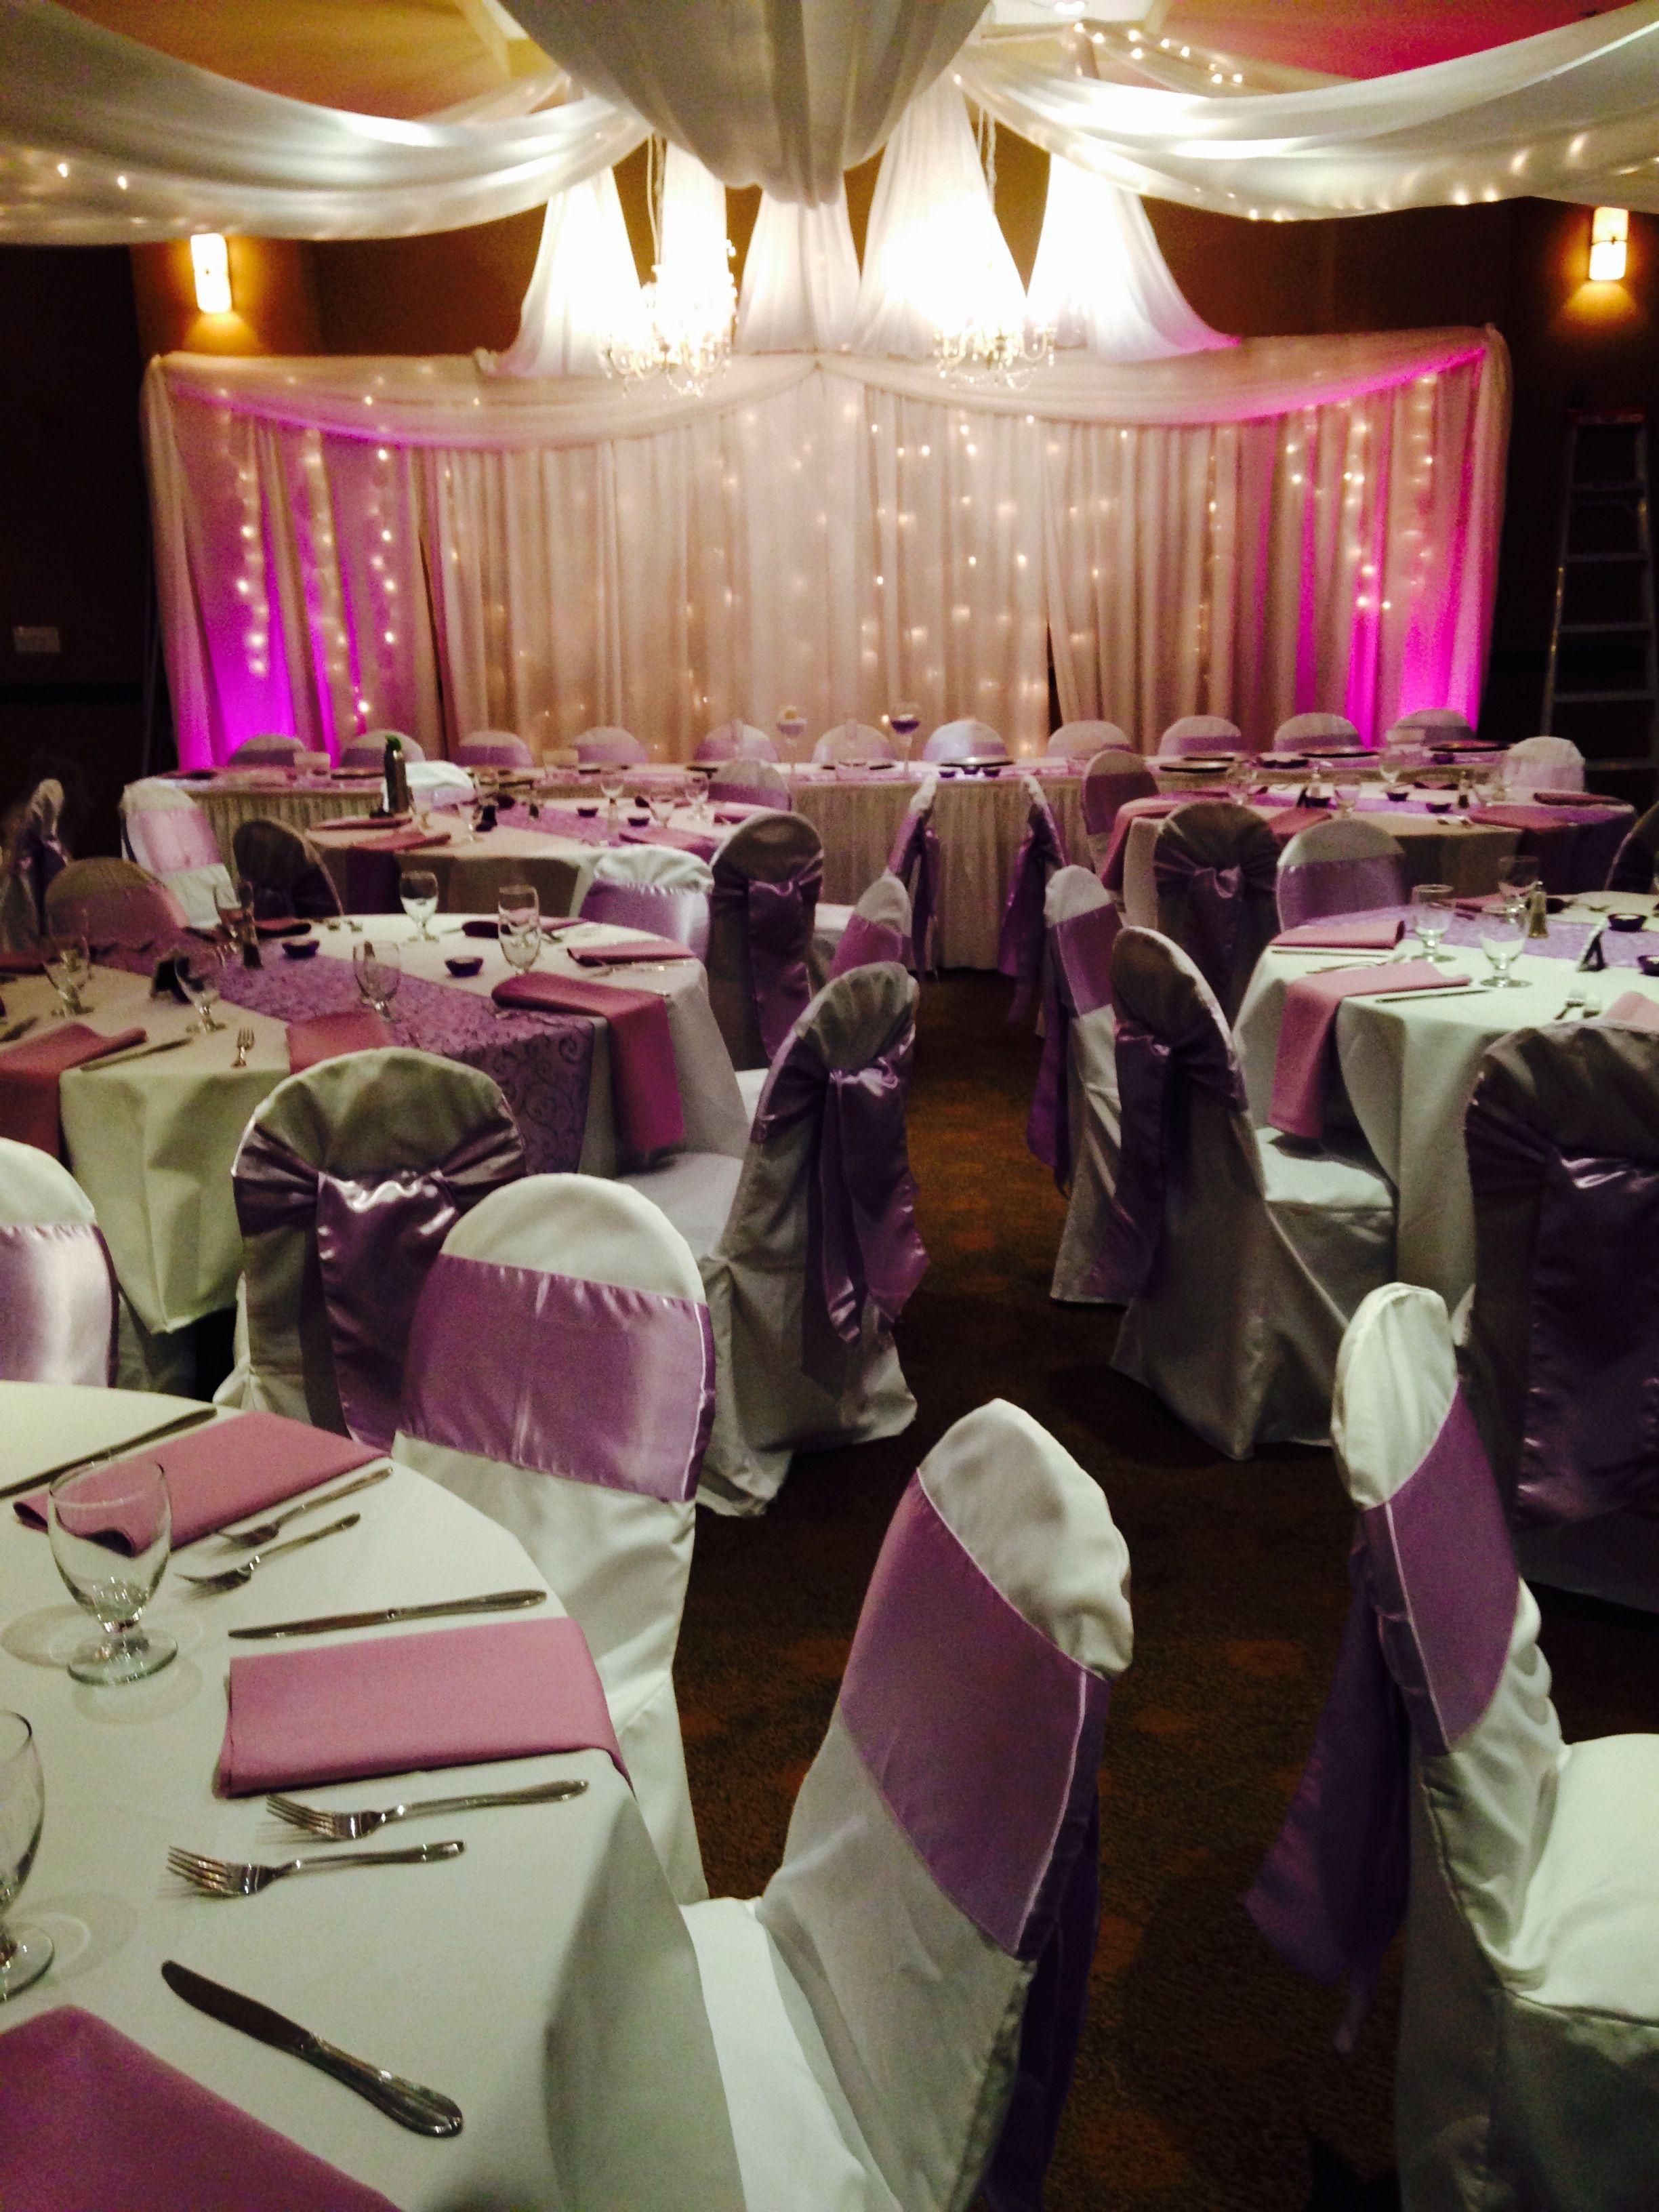 Parksville Beach Club Vancouver Island Nanaimo Parksville Venue Wedding Decor Wedding Rentals Chair Covers And Chair Wedding Rentals Ceiling Draping